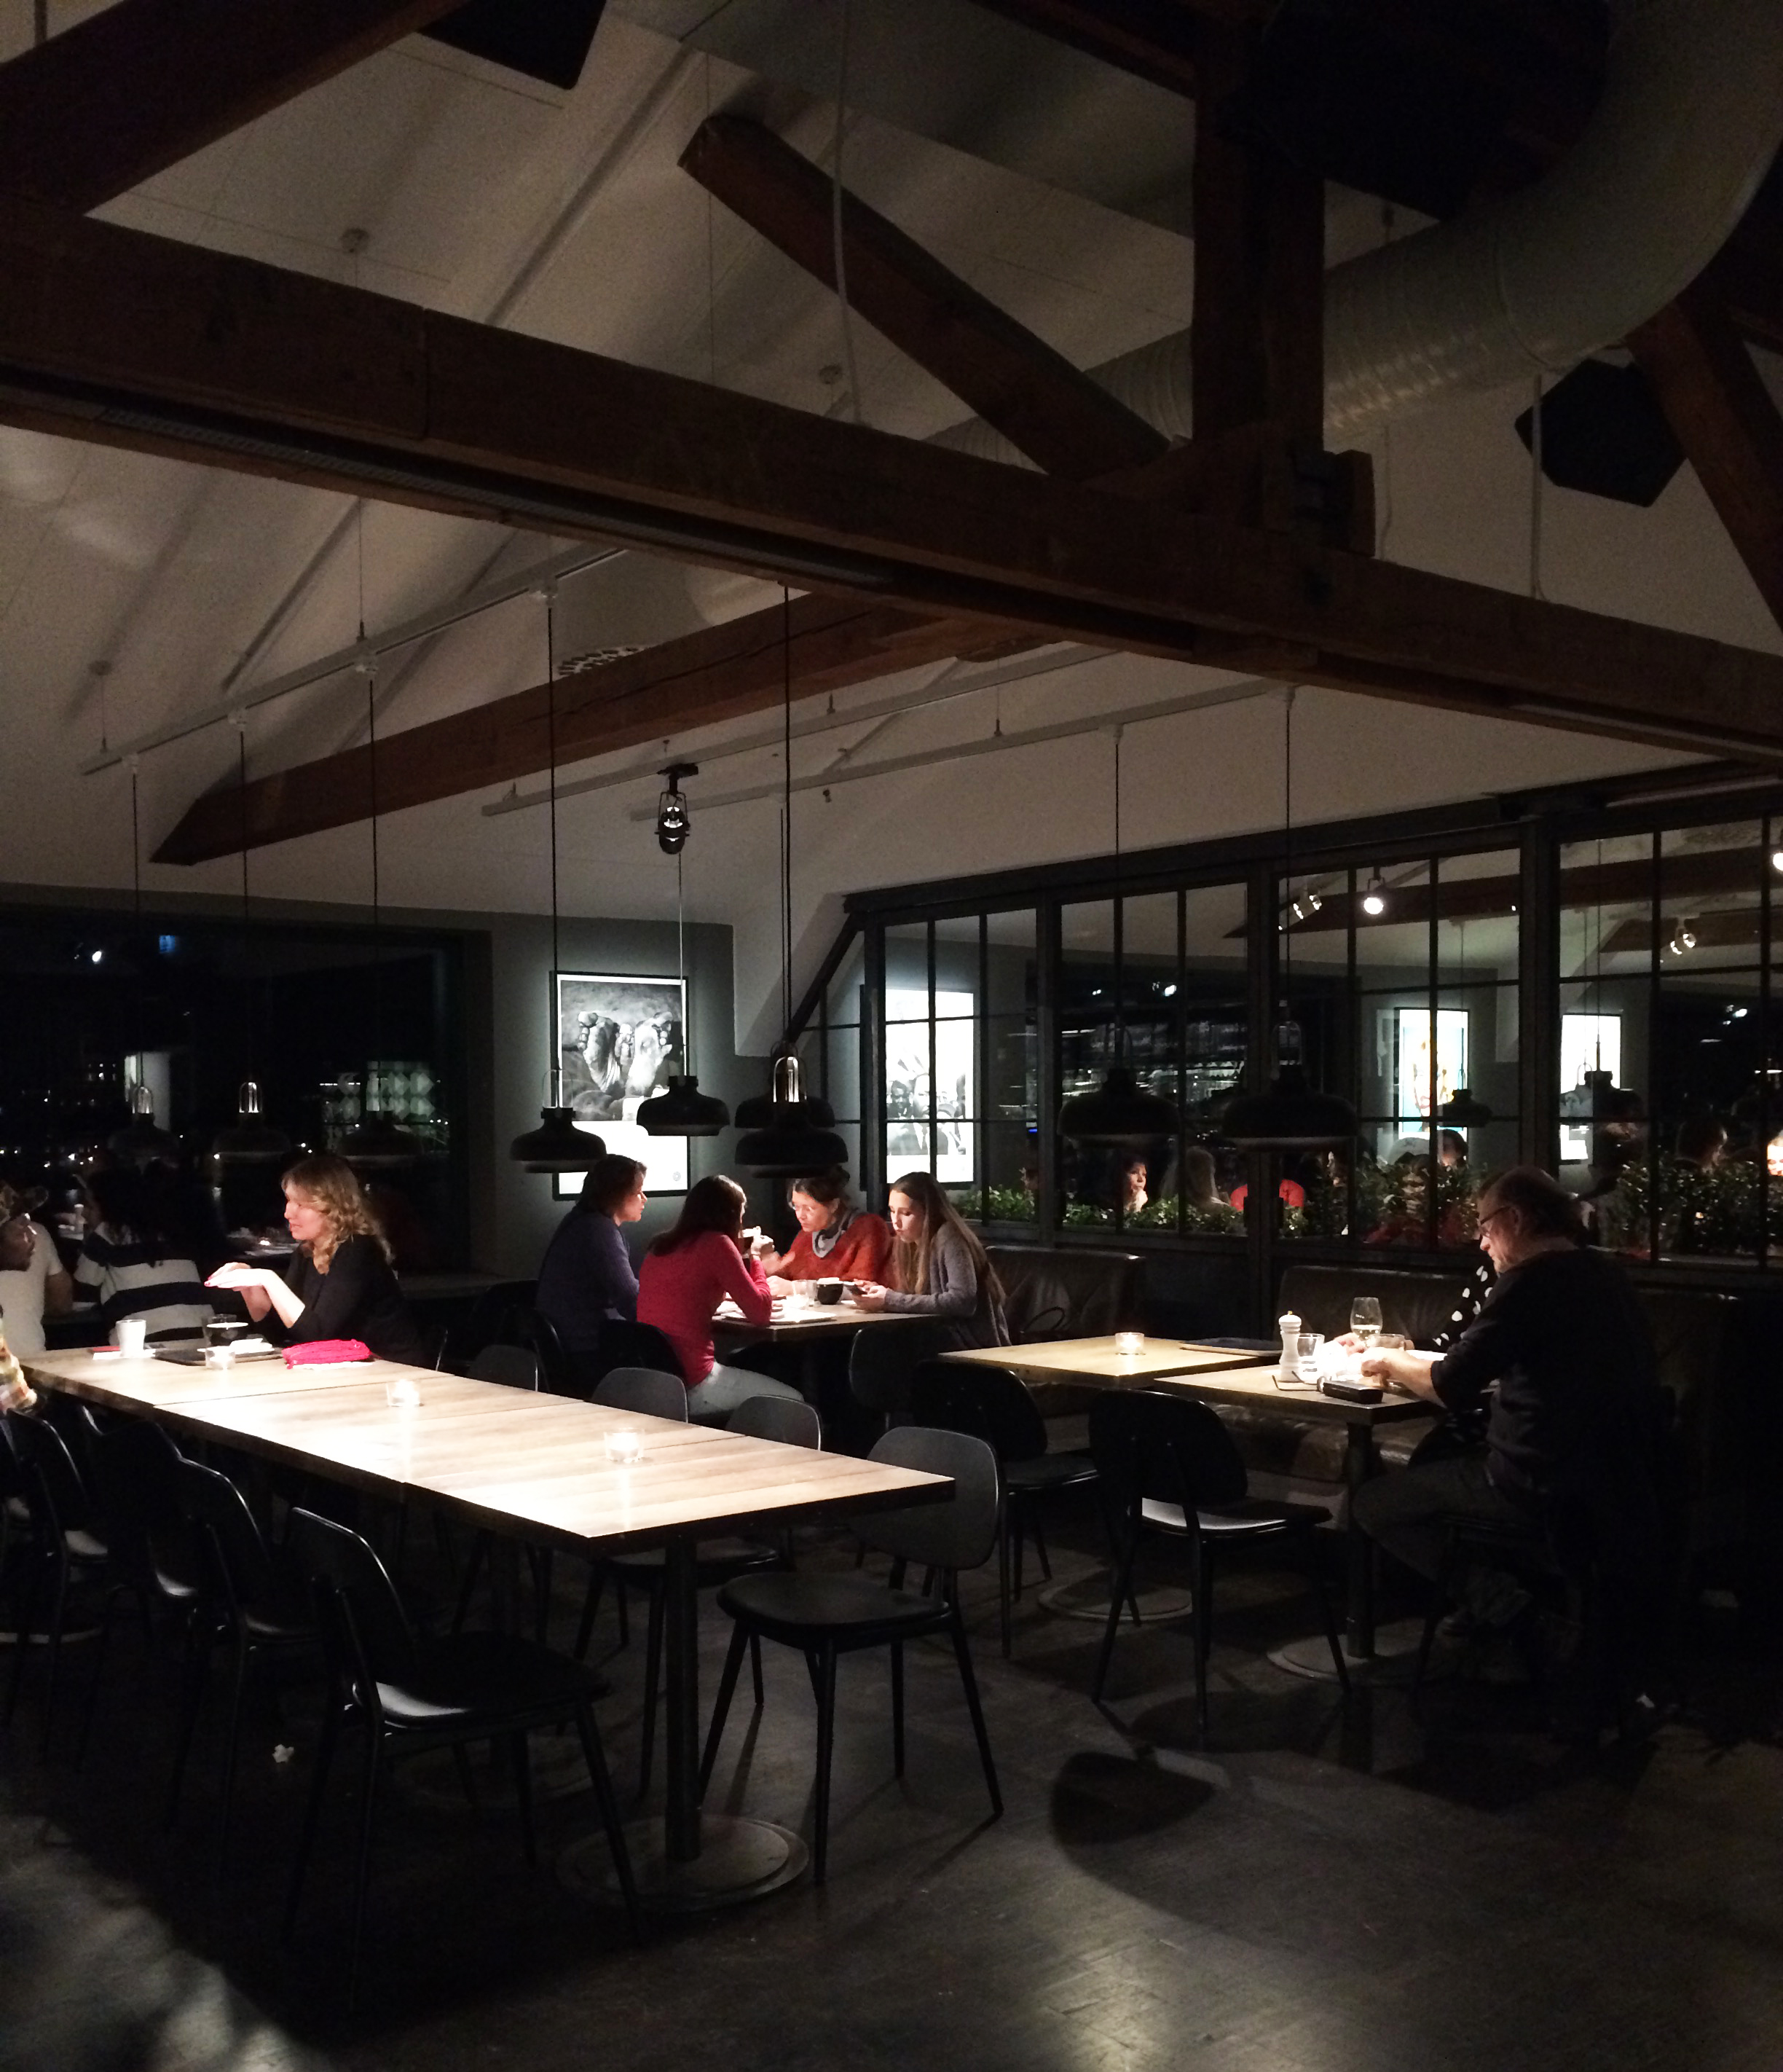 photographymuseumrestaurant.jpg